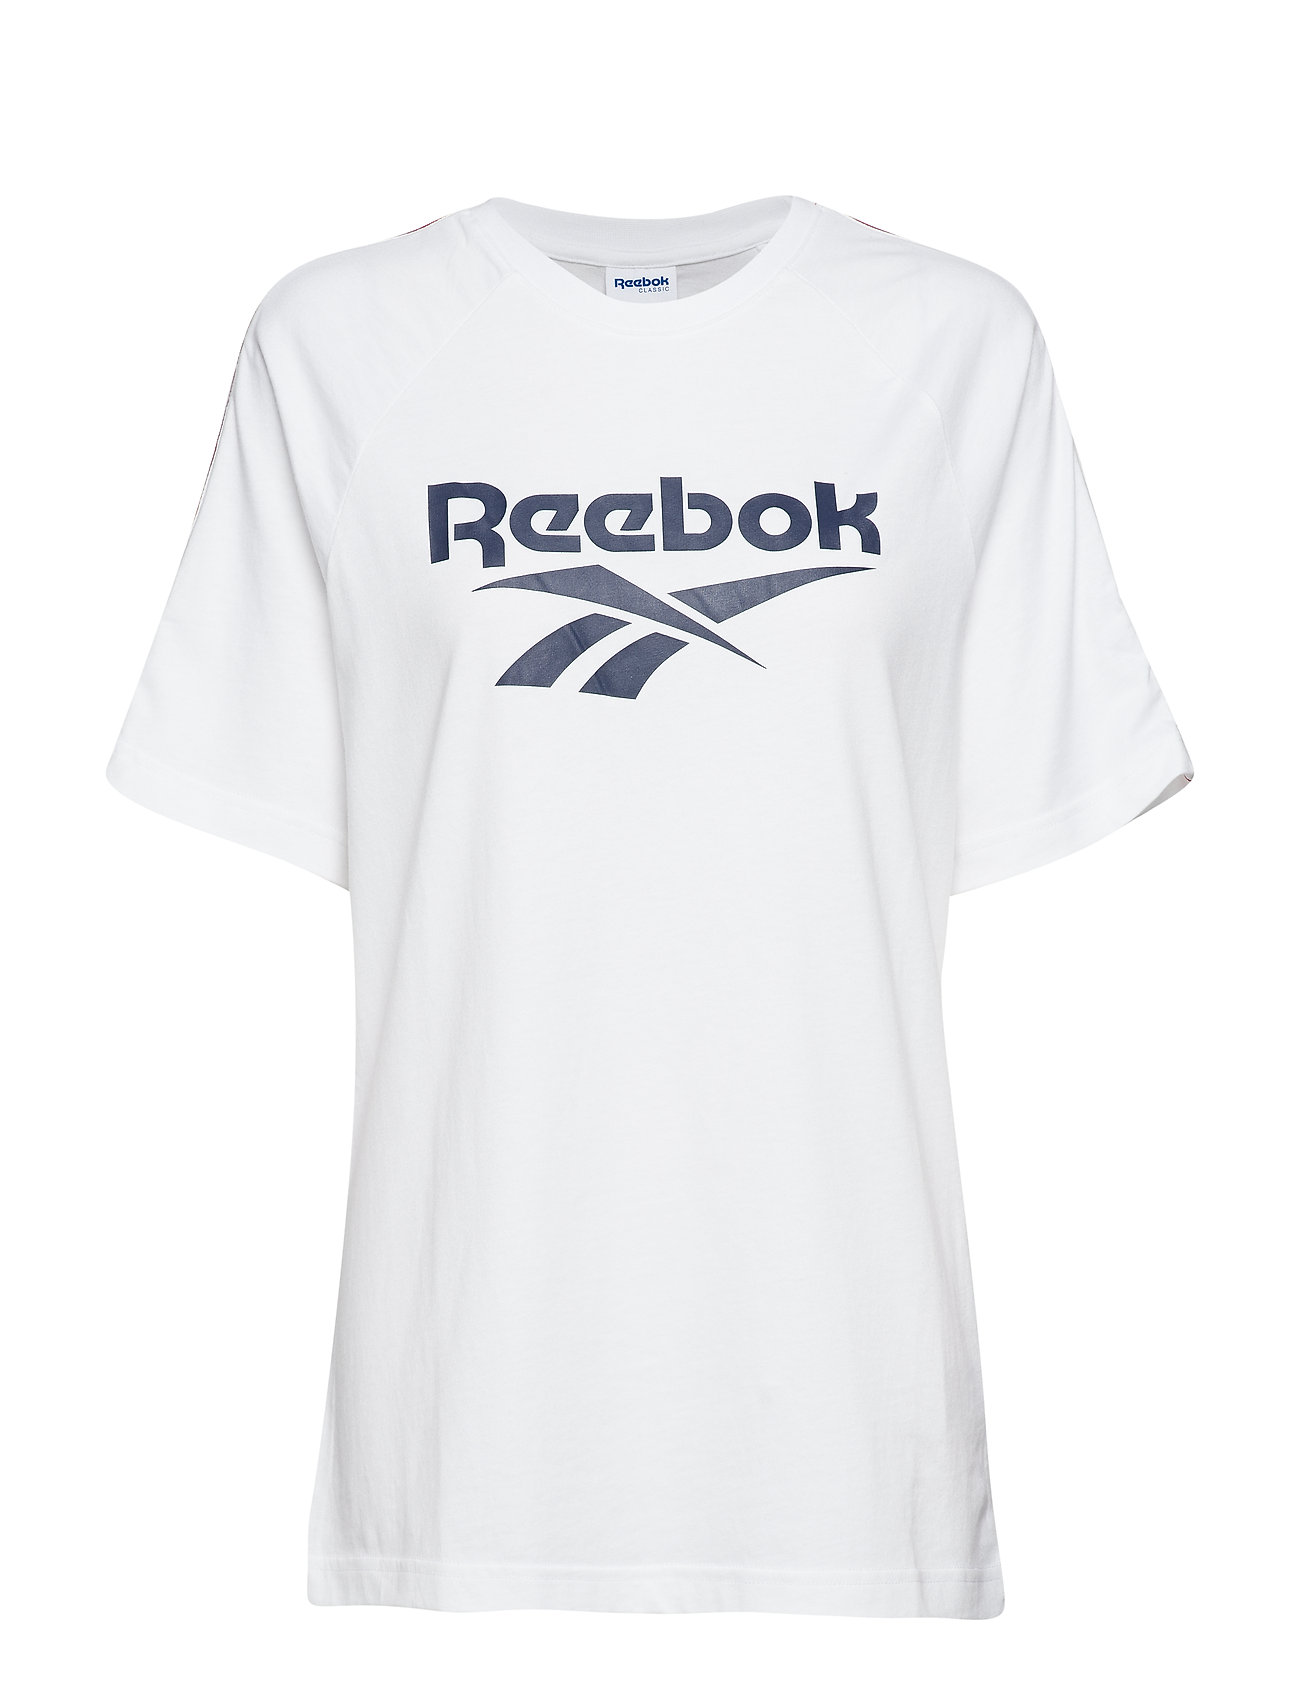 Reebok Classics CL V P TEE UNISEX - WHITE